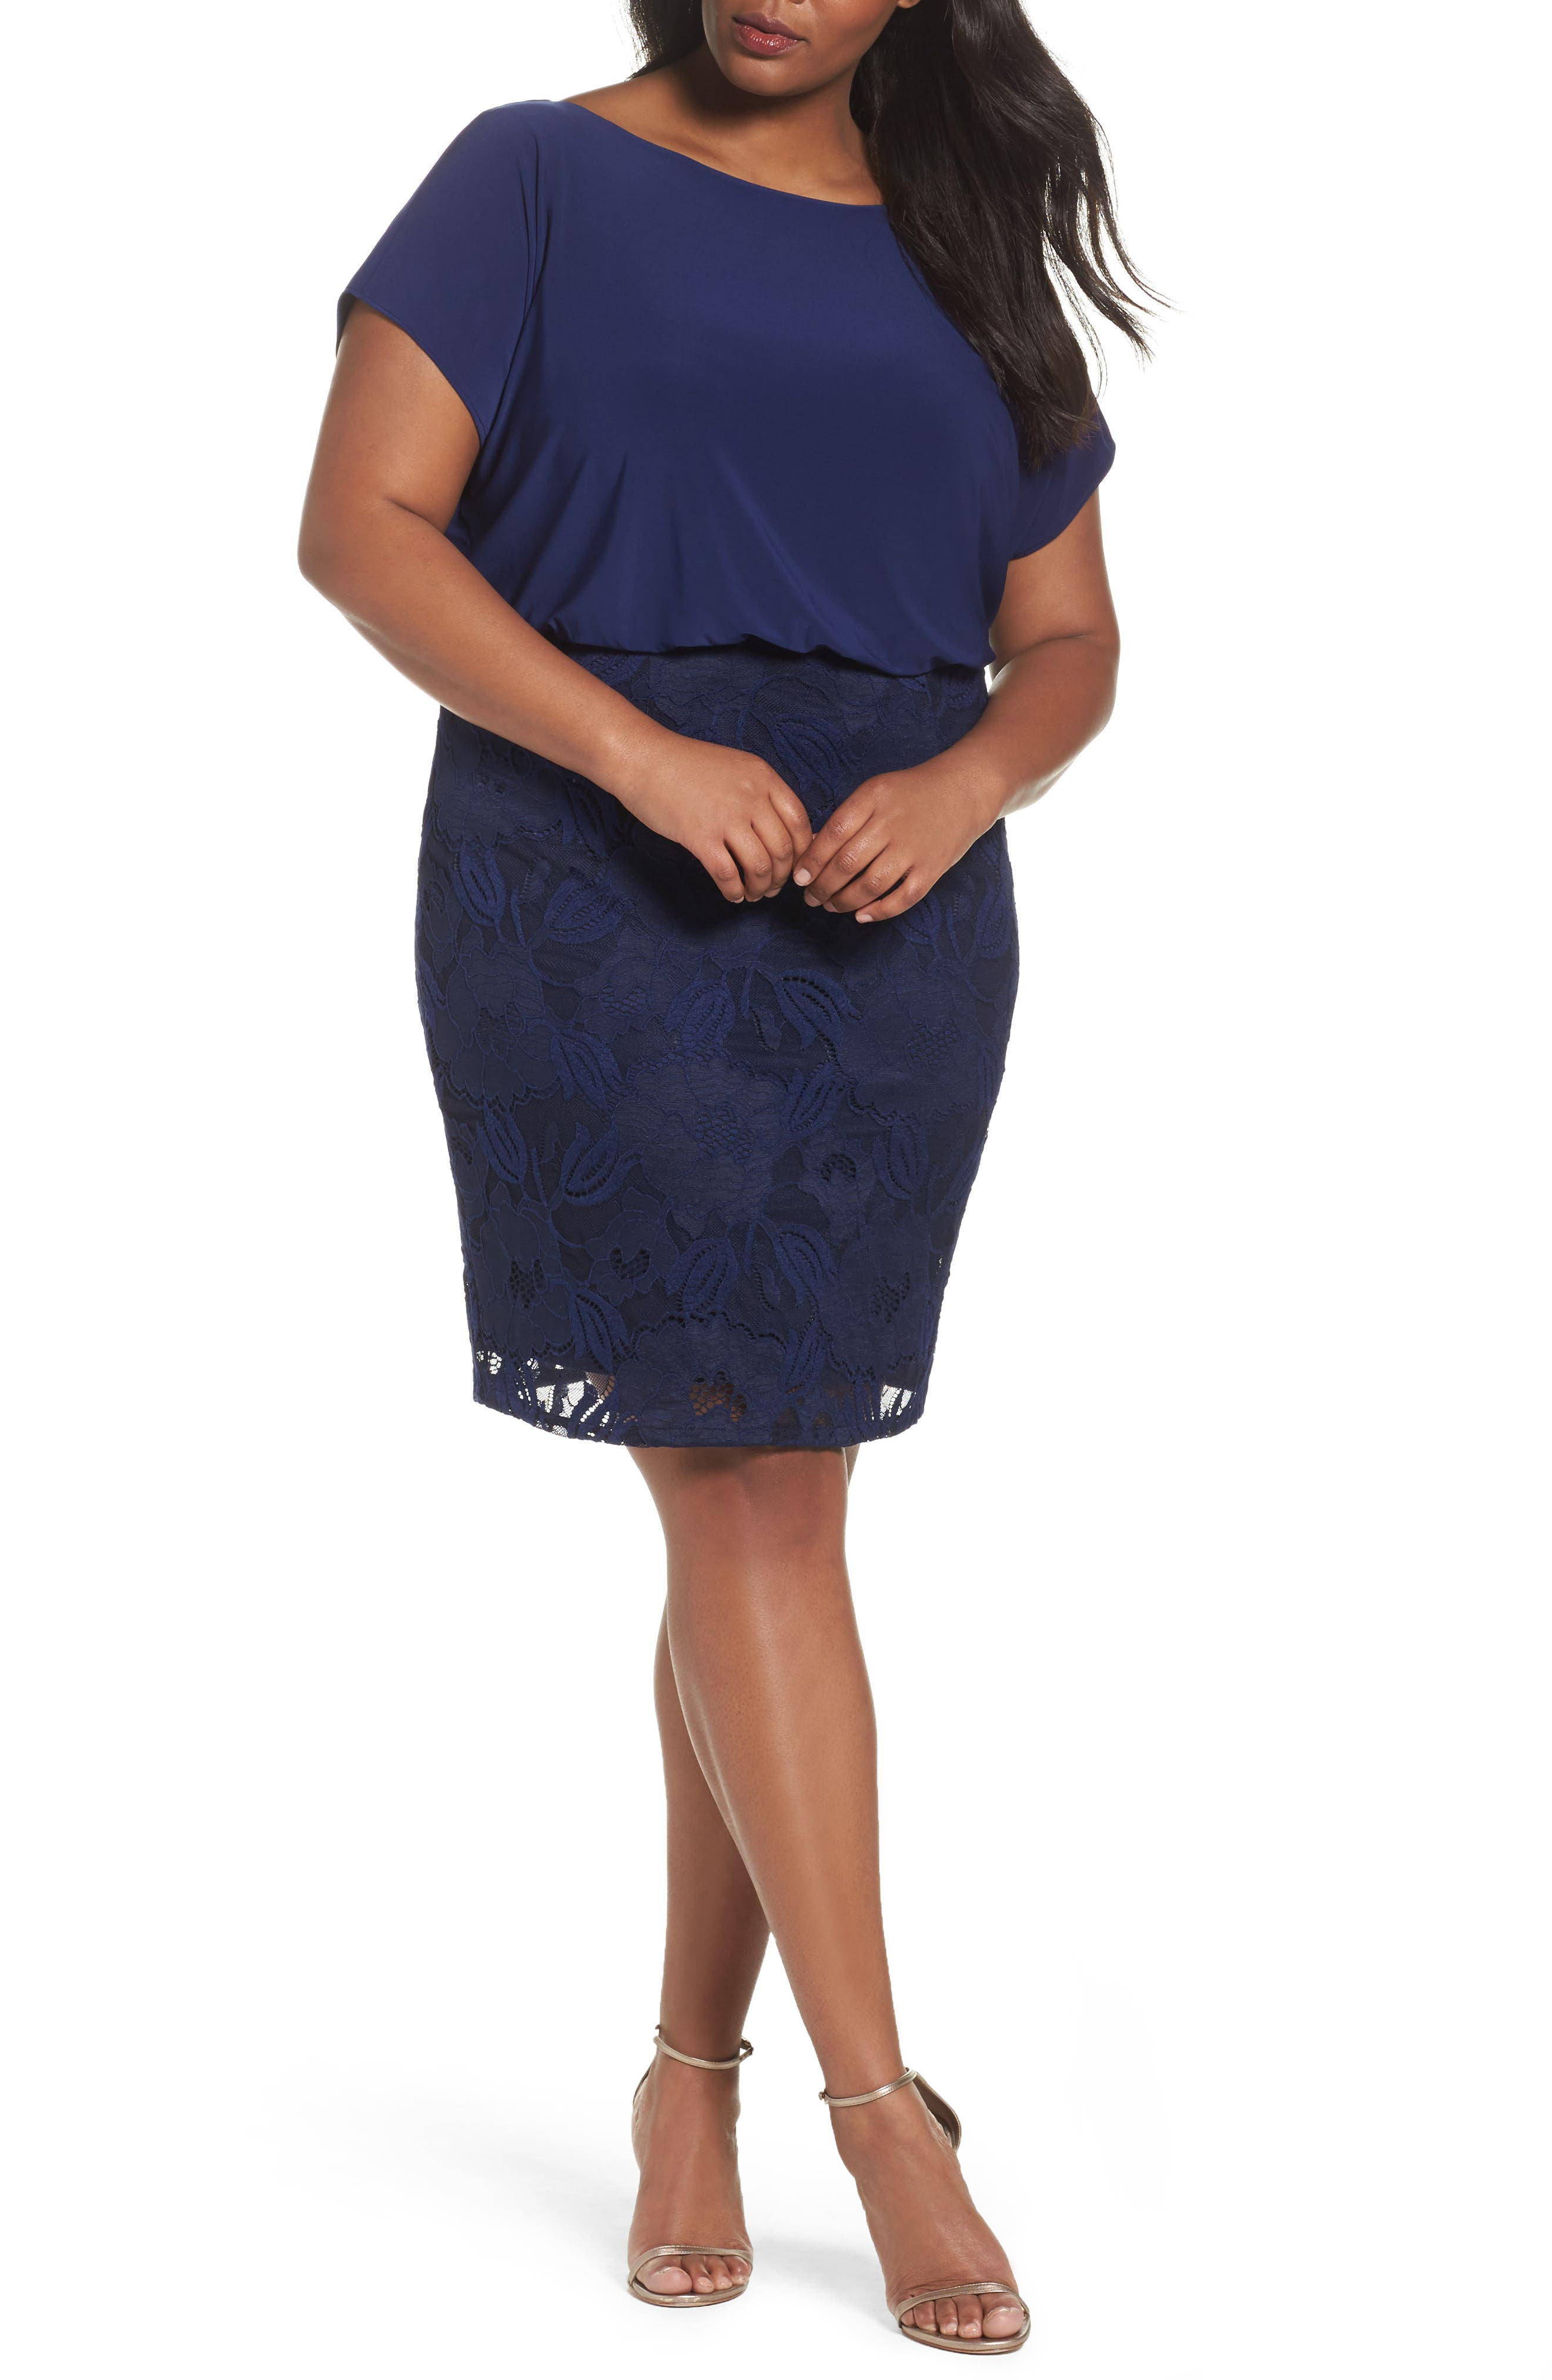 Adrianna Papell Mixed Media Blouson Dress (Plus Size)